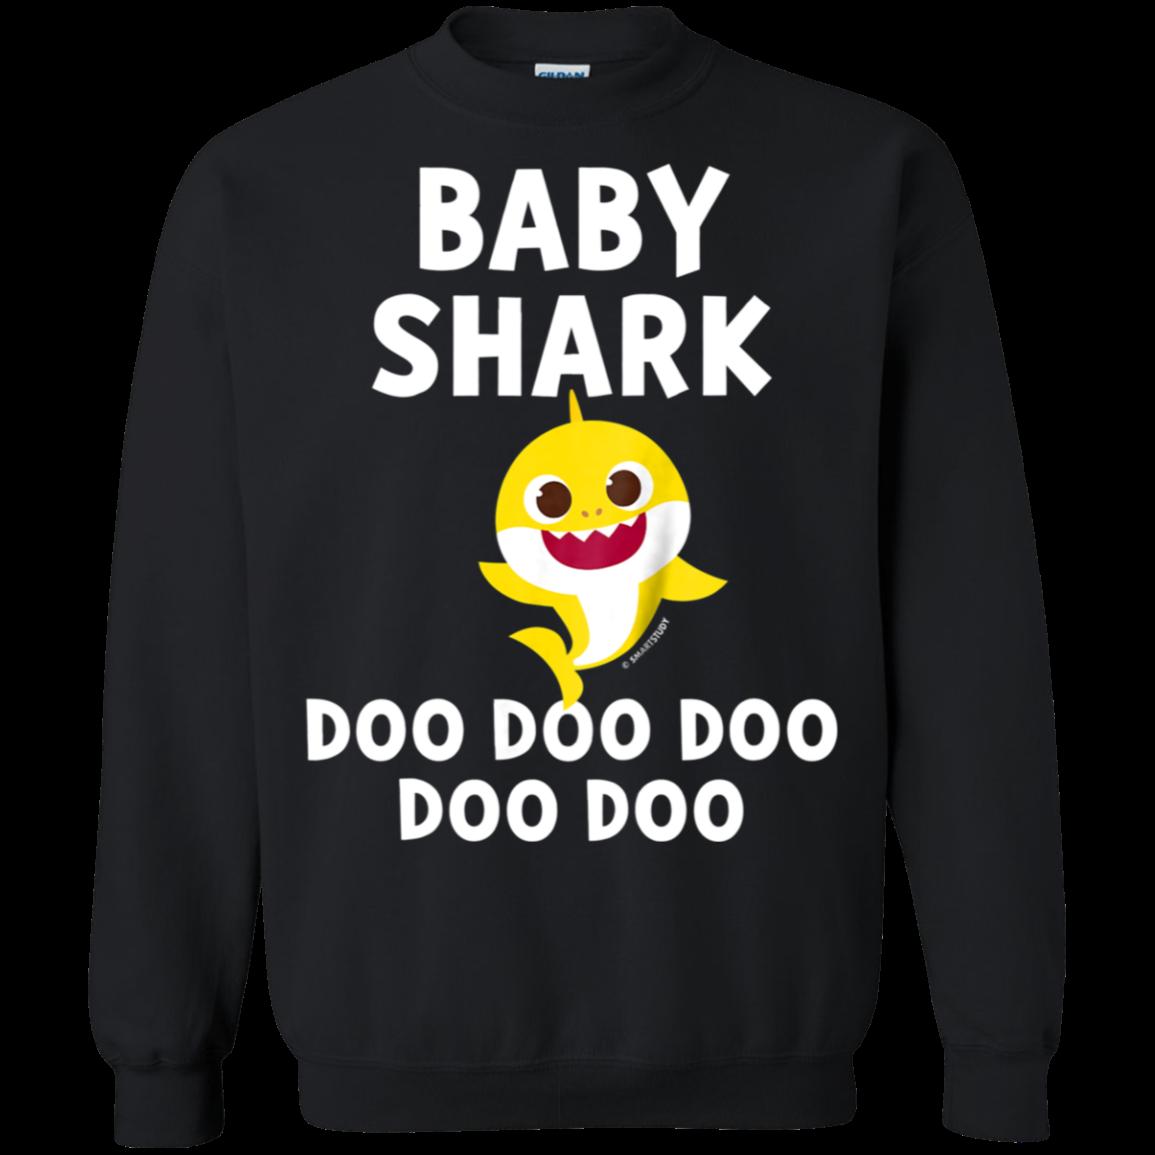 Pinkfong Baby Shark Shirts